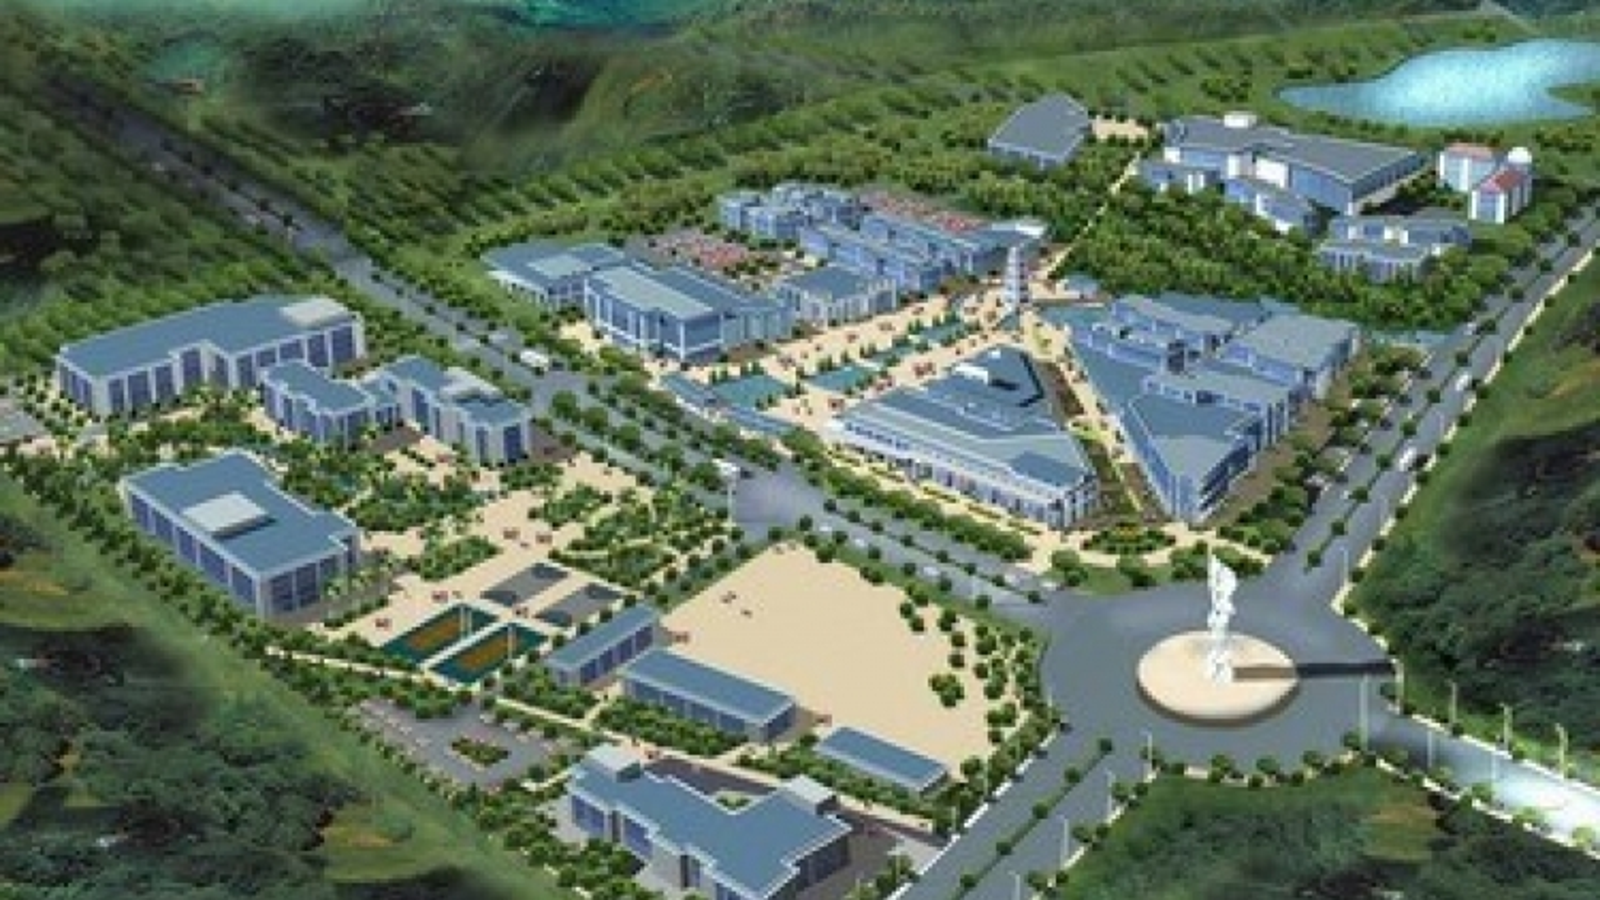 Japan gives ODA loans to Hoa Lac project